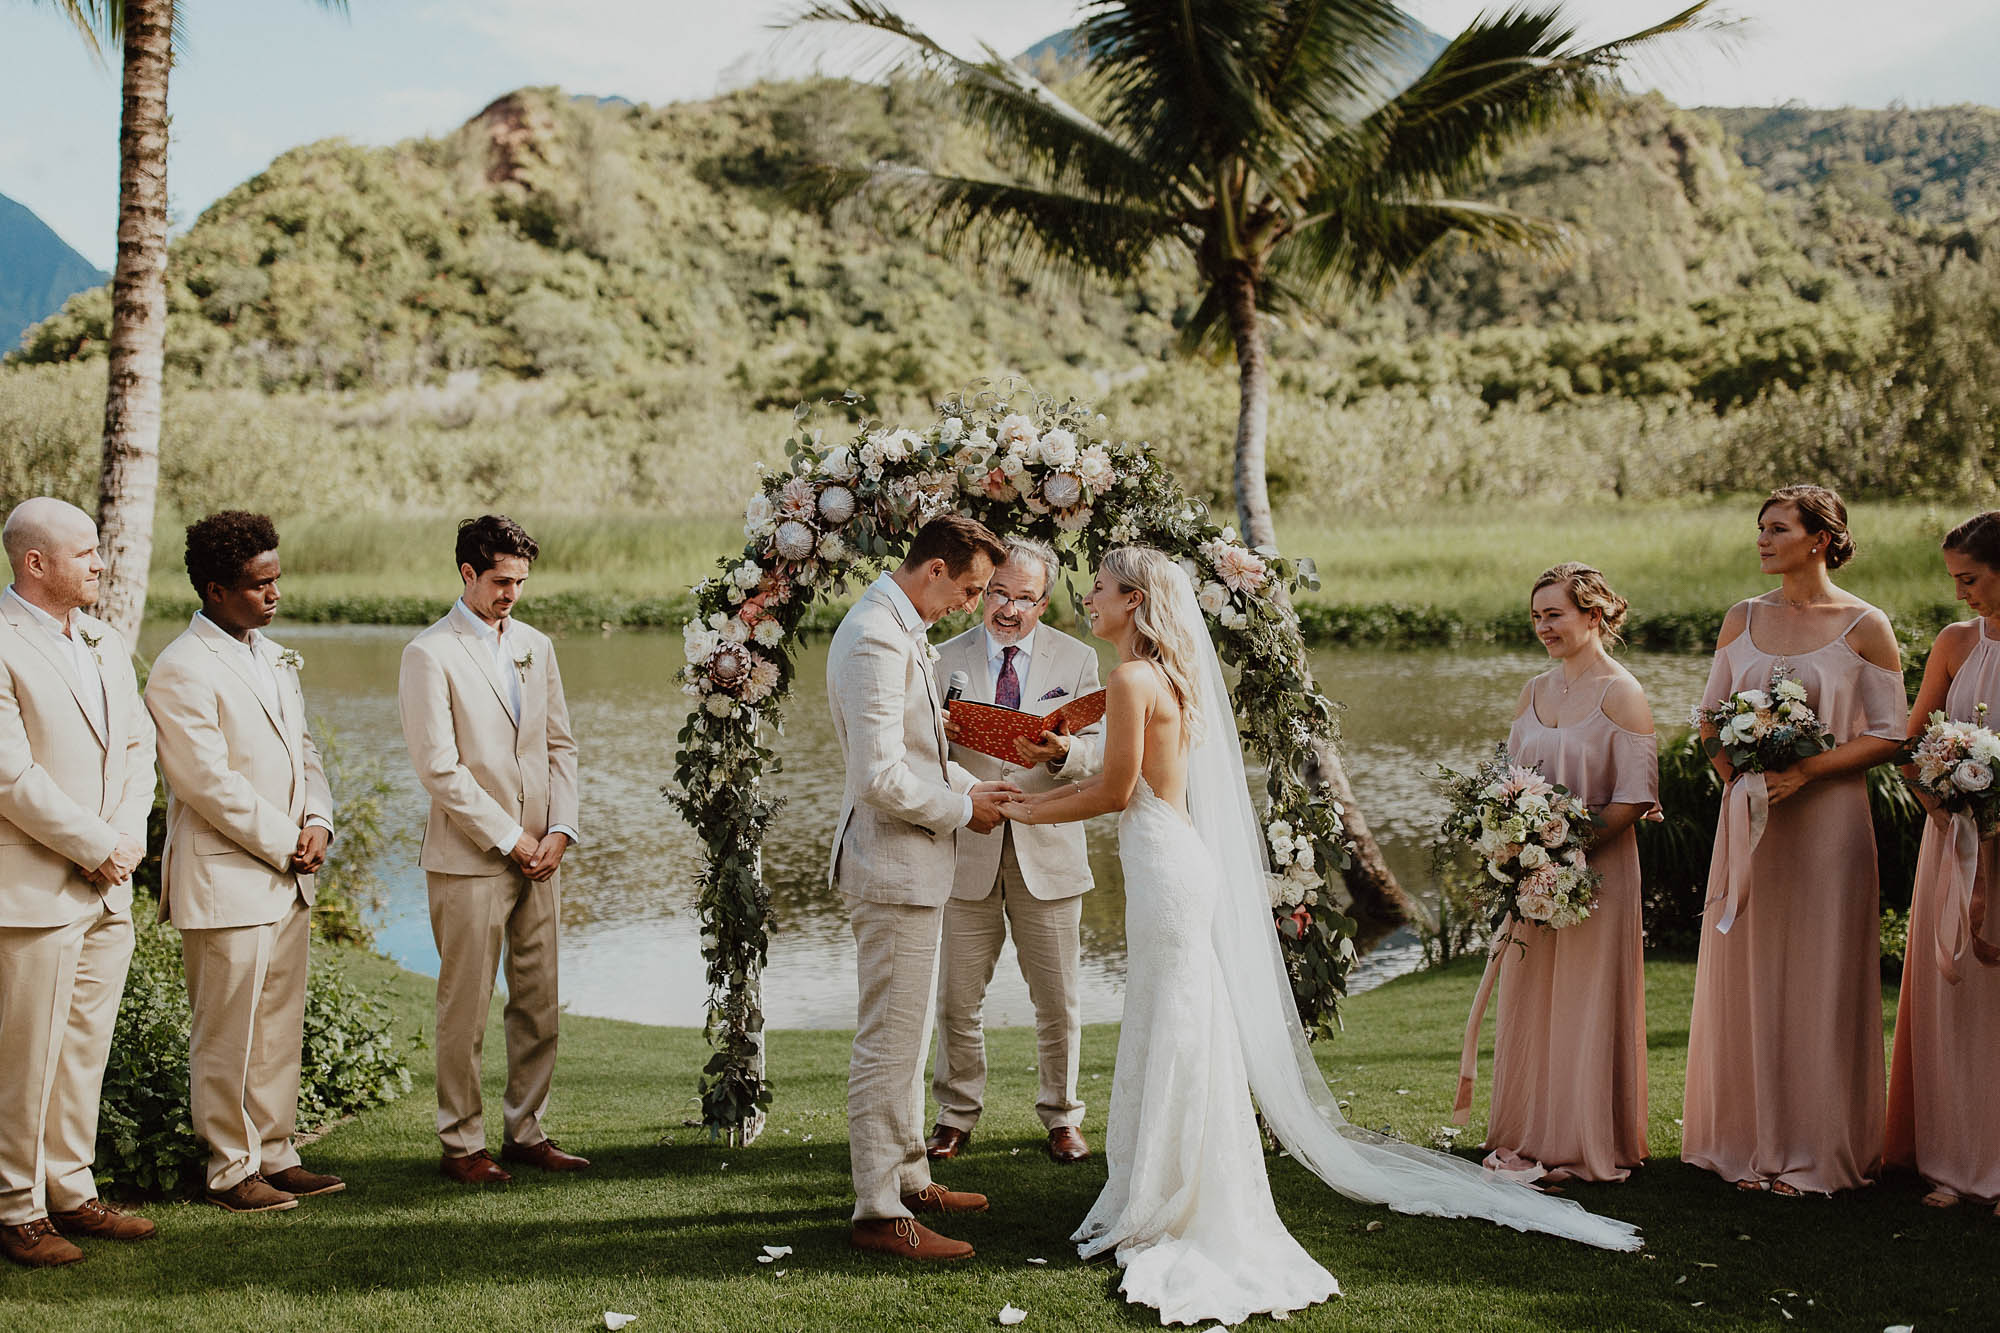 Saying vows under arch north shore kauai wedding day